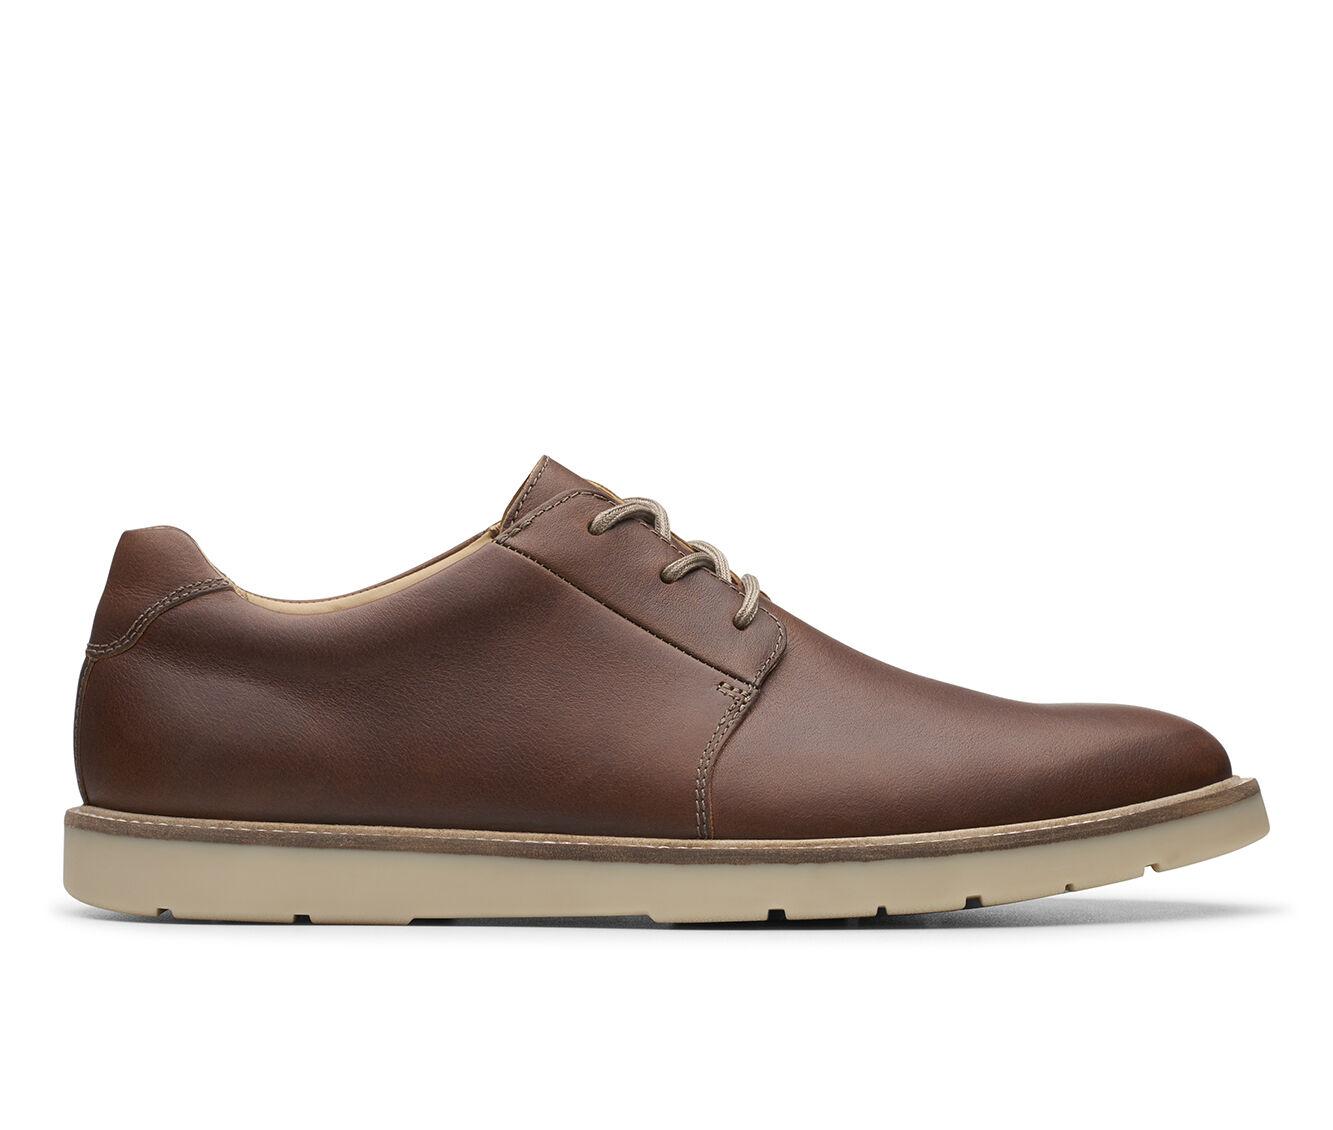 Men's Clarks Grandin Plain Dress Shoes Tan